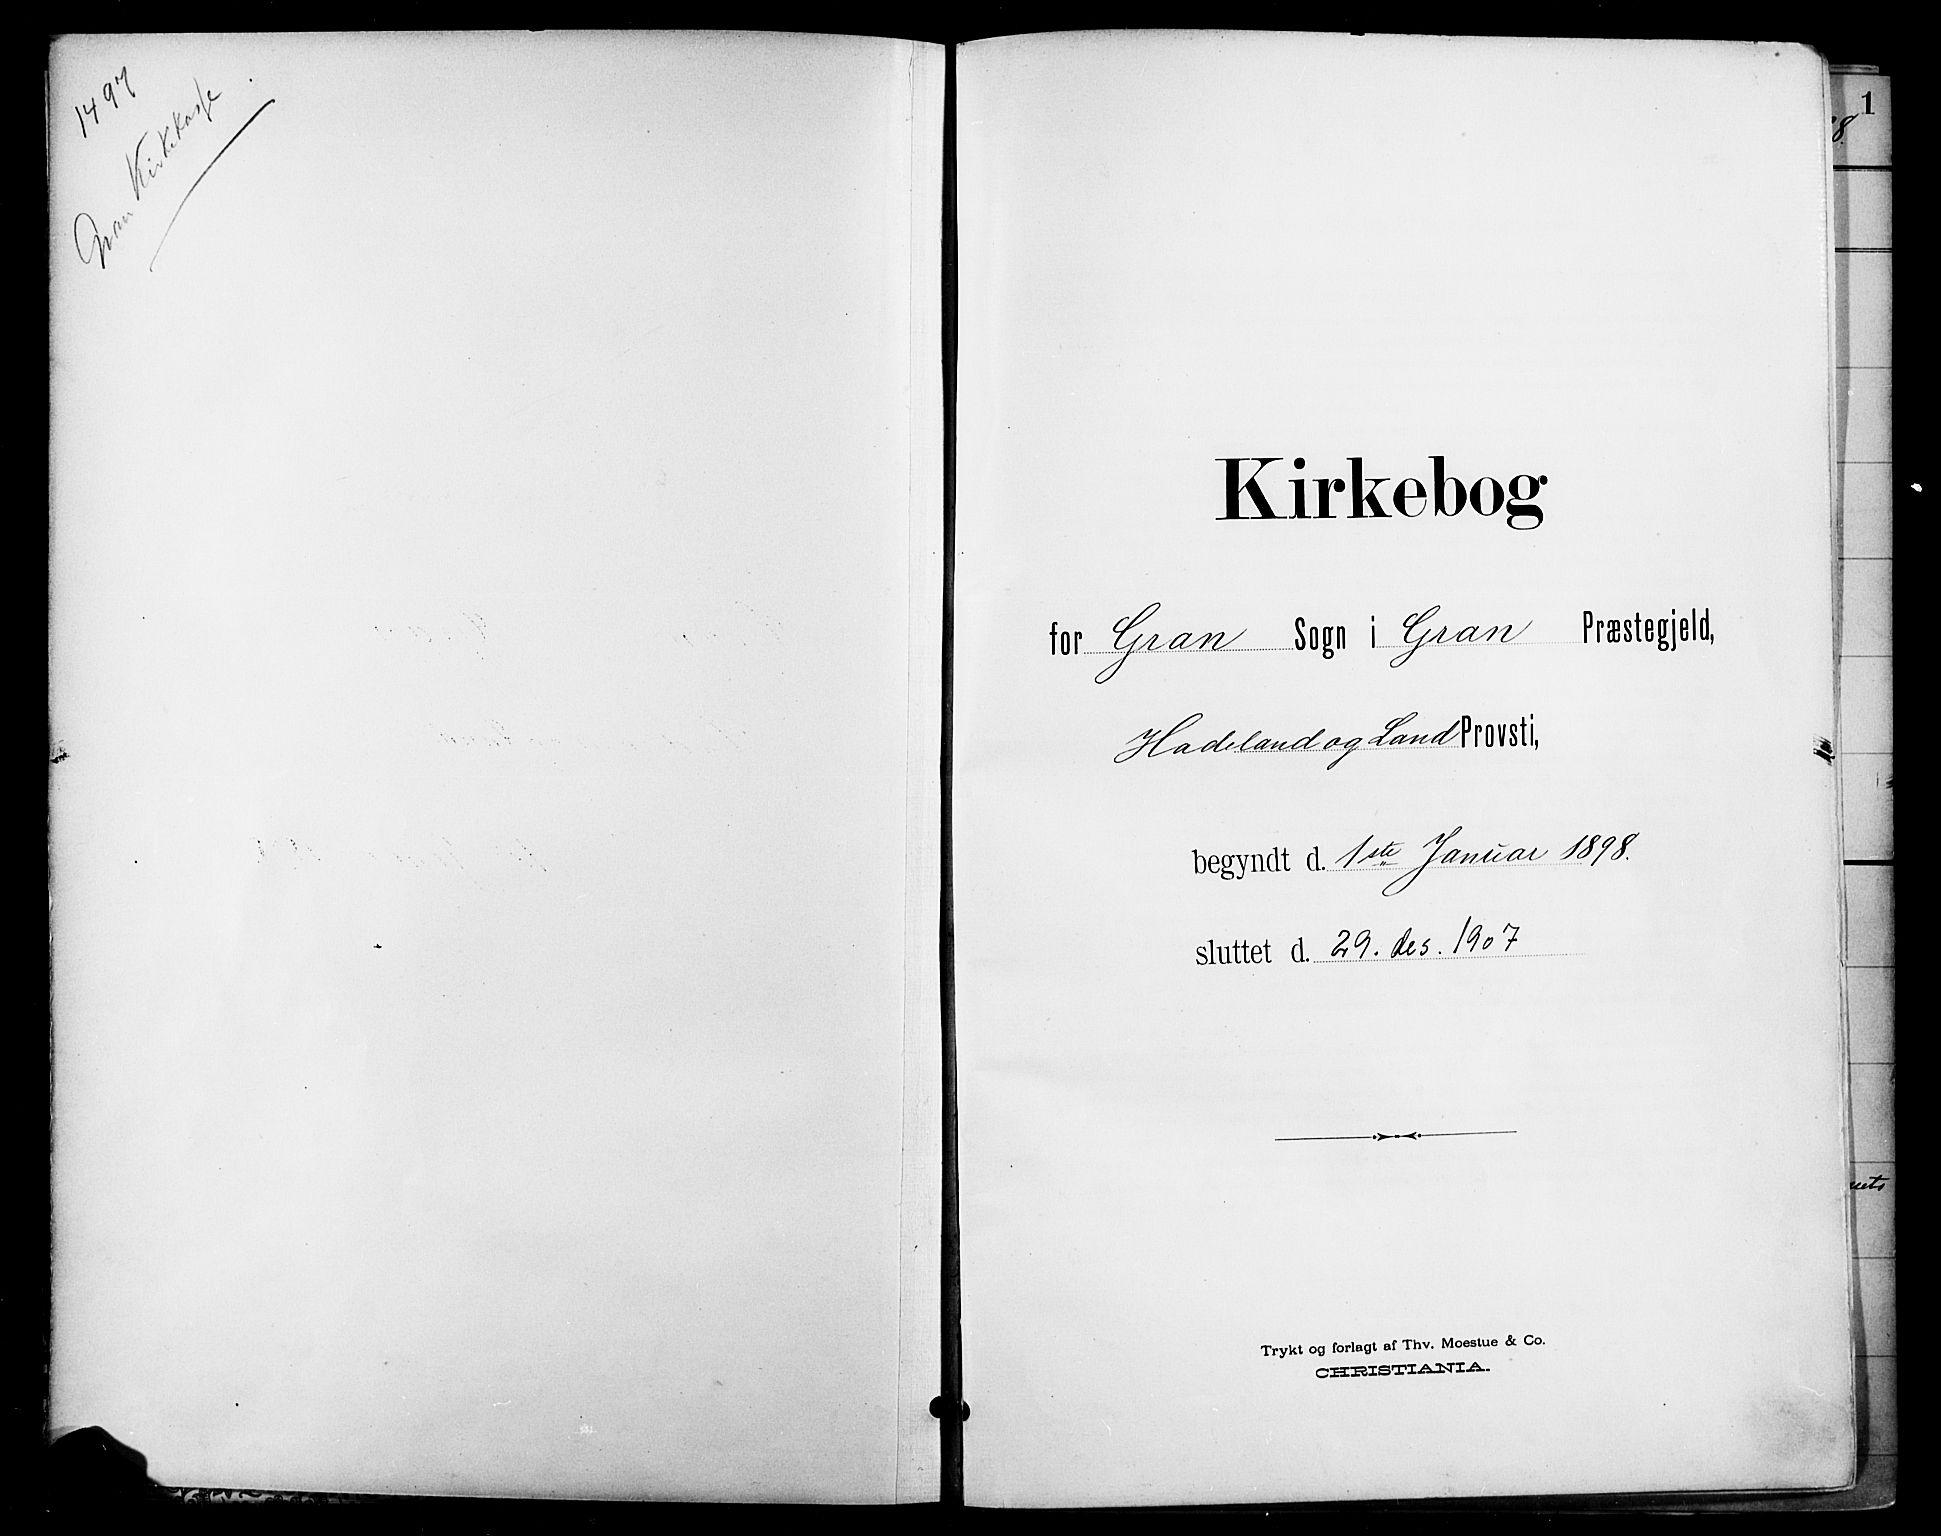 SAH, Gran prestekontor, Ministerialbok nr. 19, 1898-1907